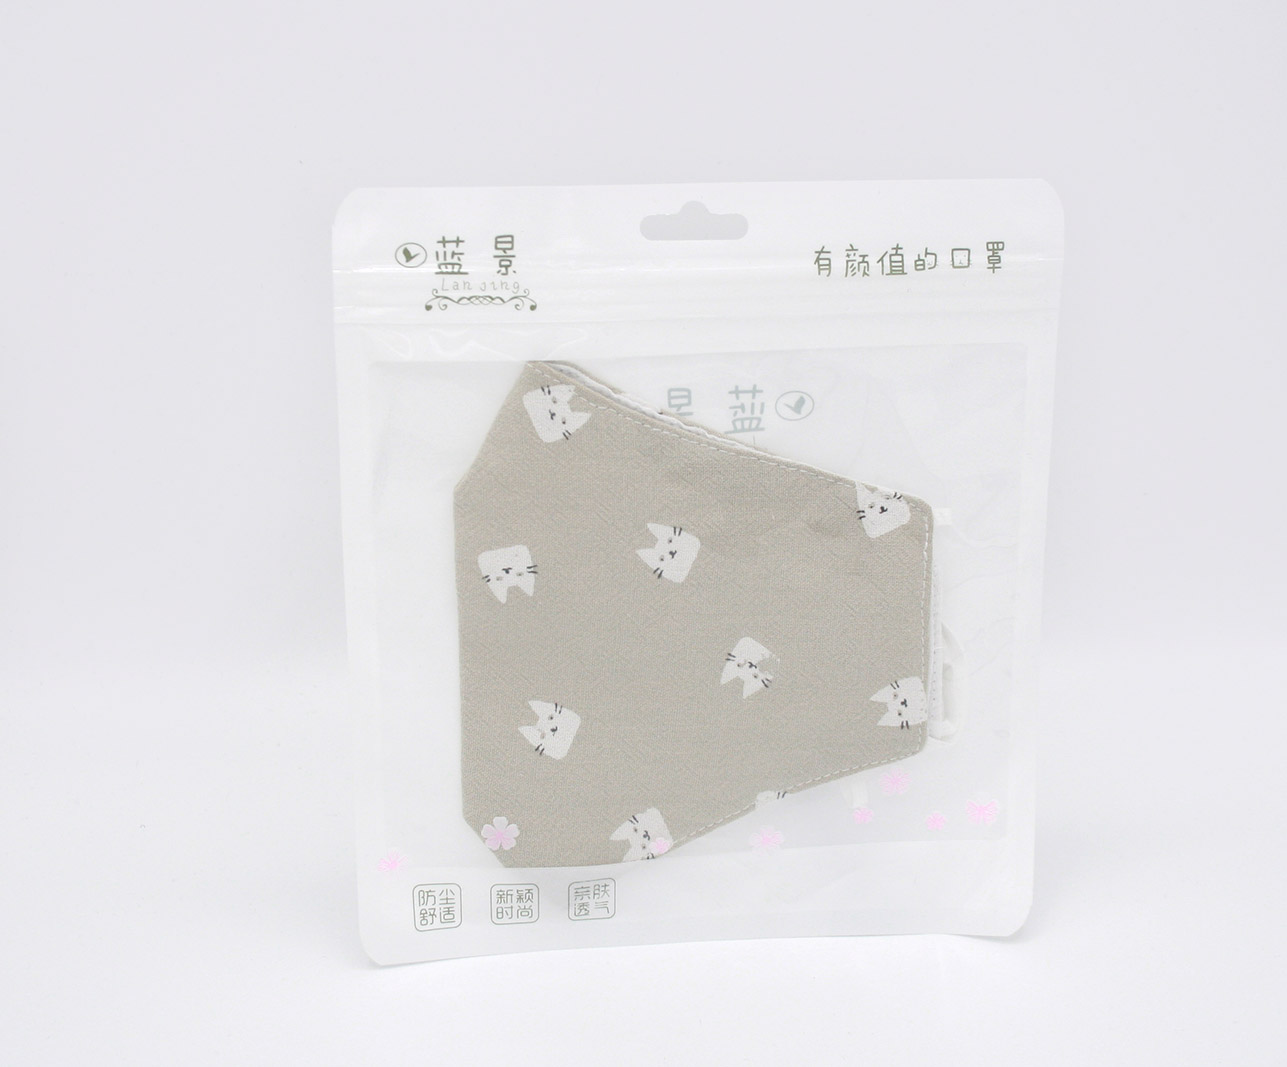 SEPIO Mondmasker katoen geel mondkapje met opdruk poes (4)